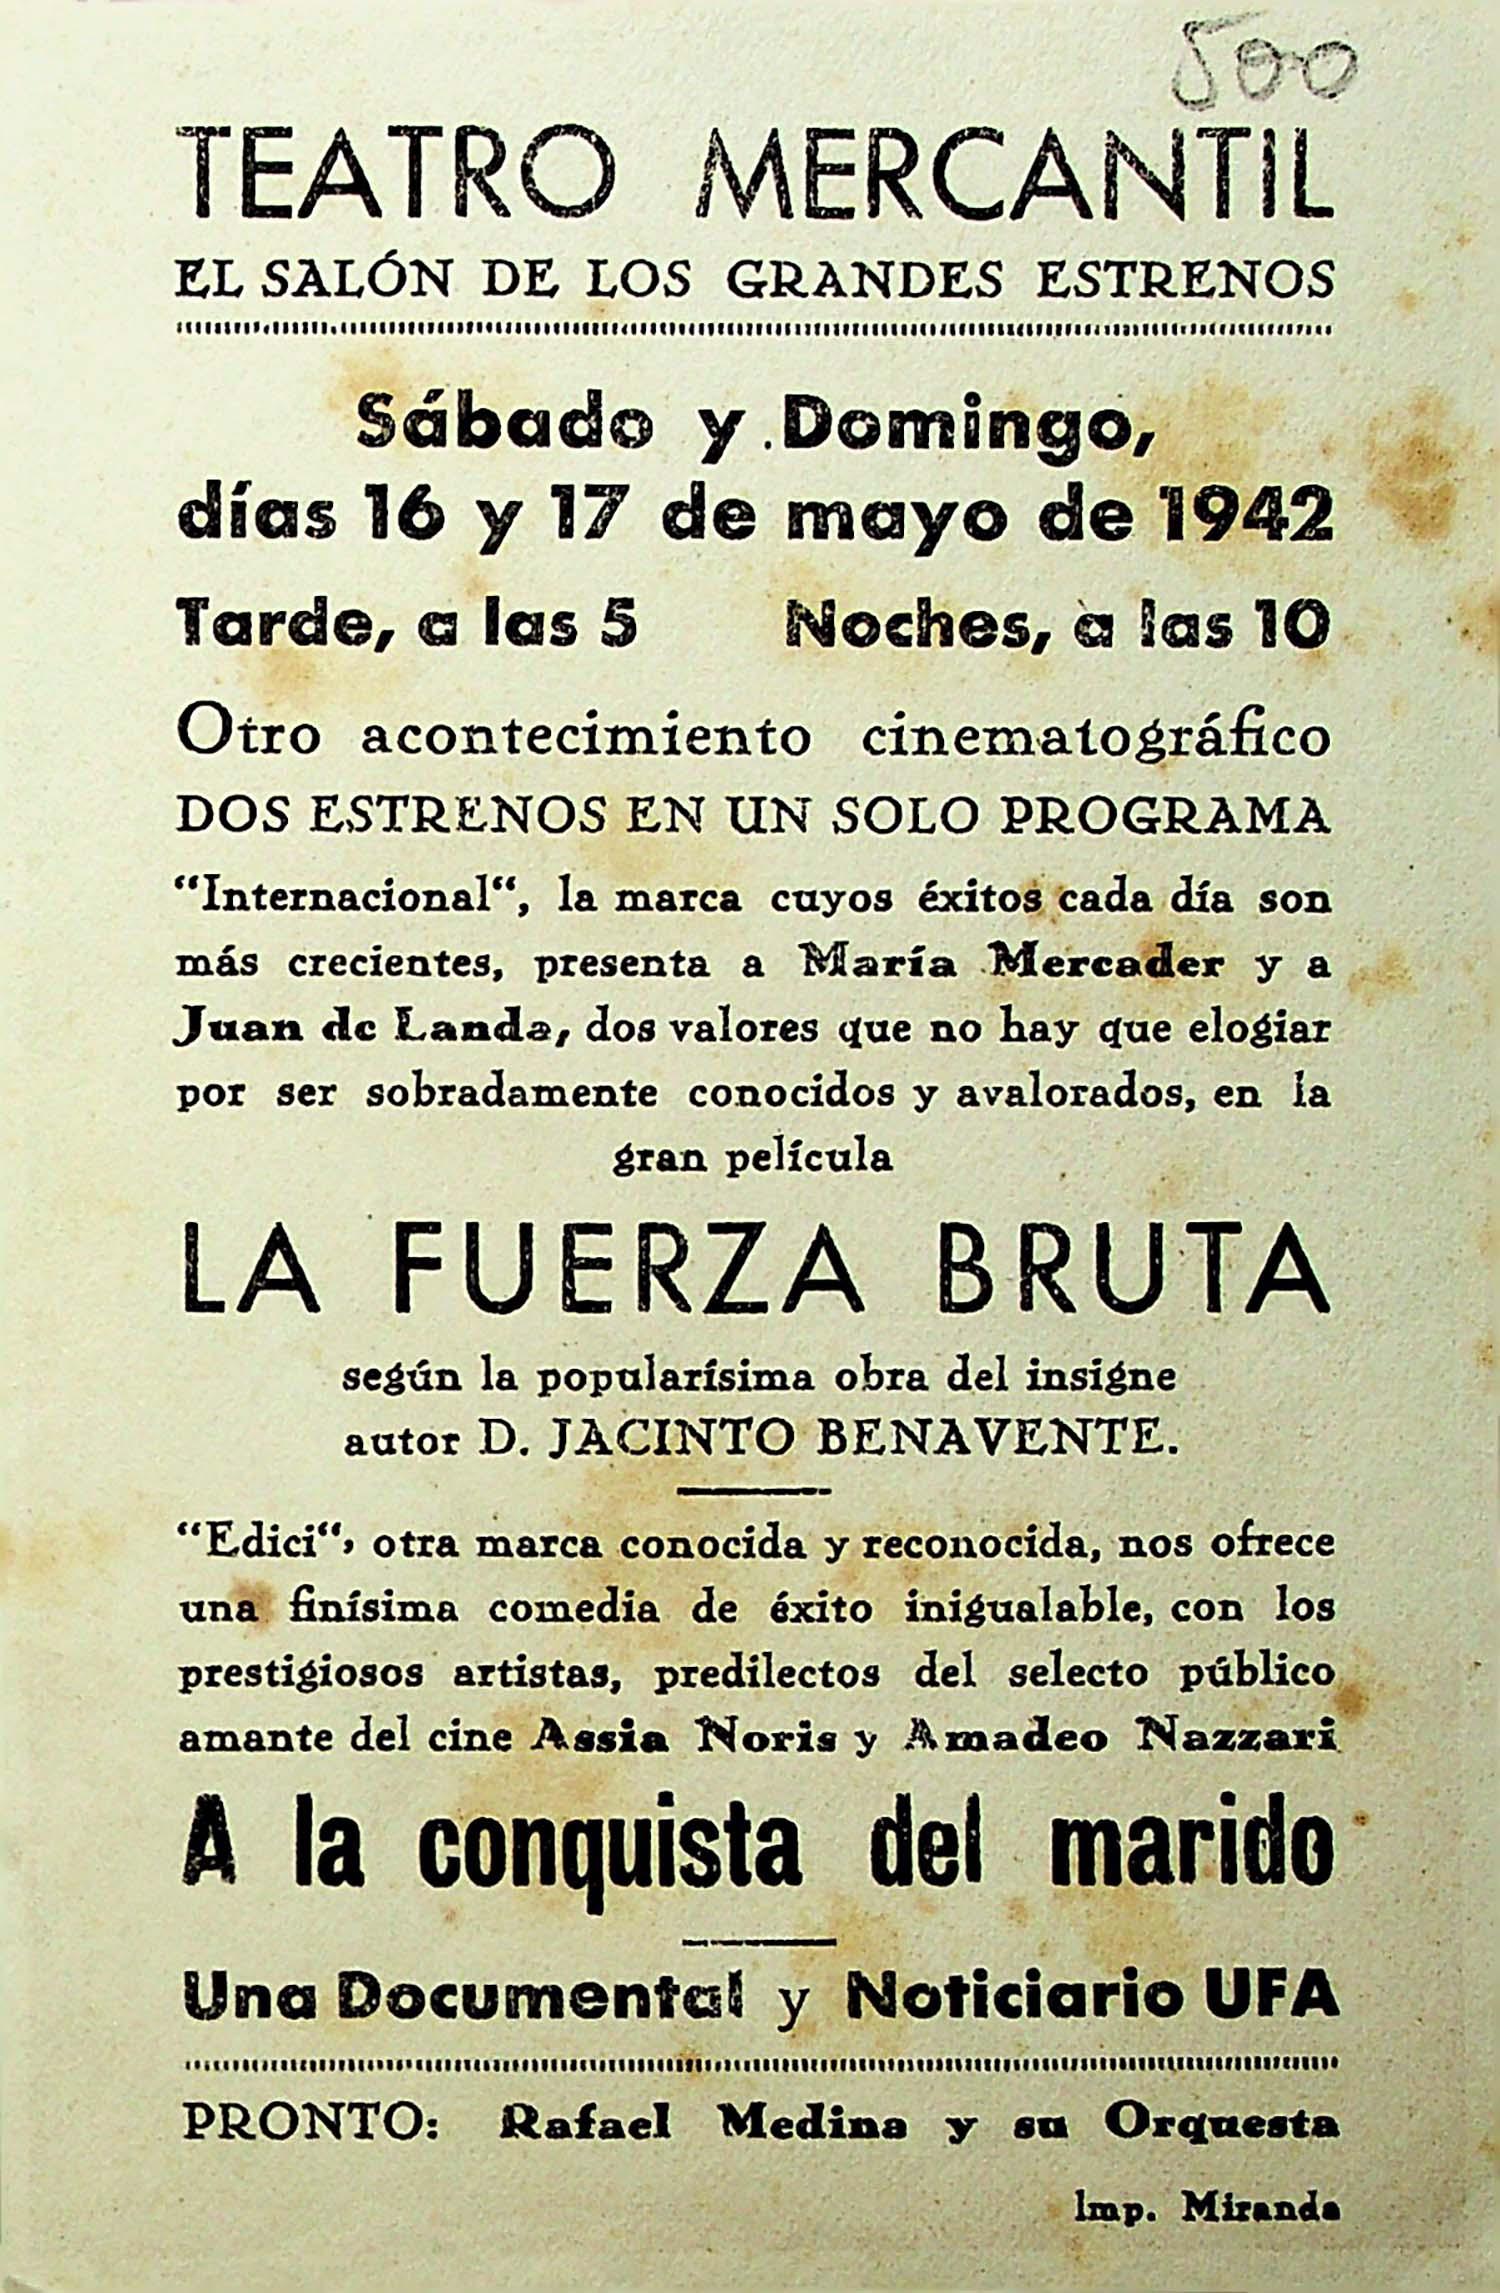 PROGRAMA DE MANO. A LA CONQUISTA DEL MARIDO. Assia Noris. CP